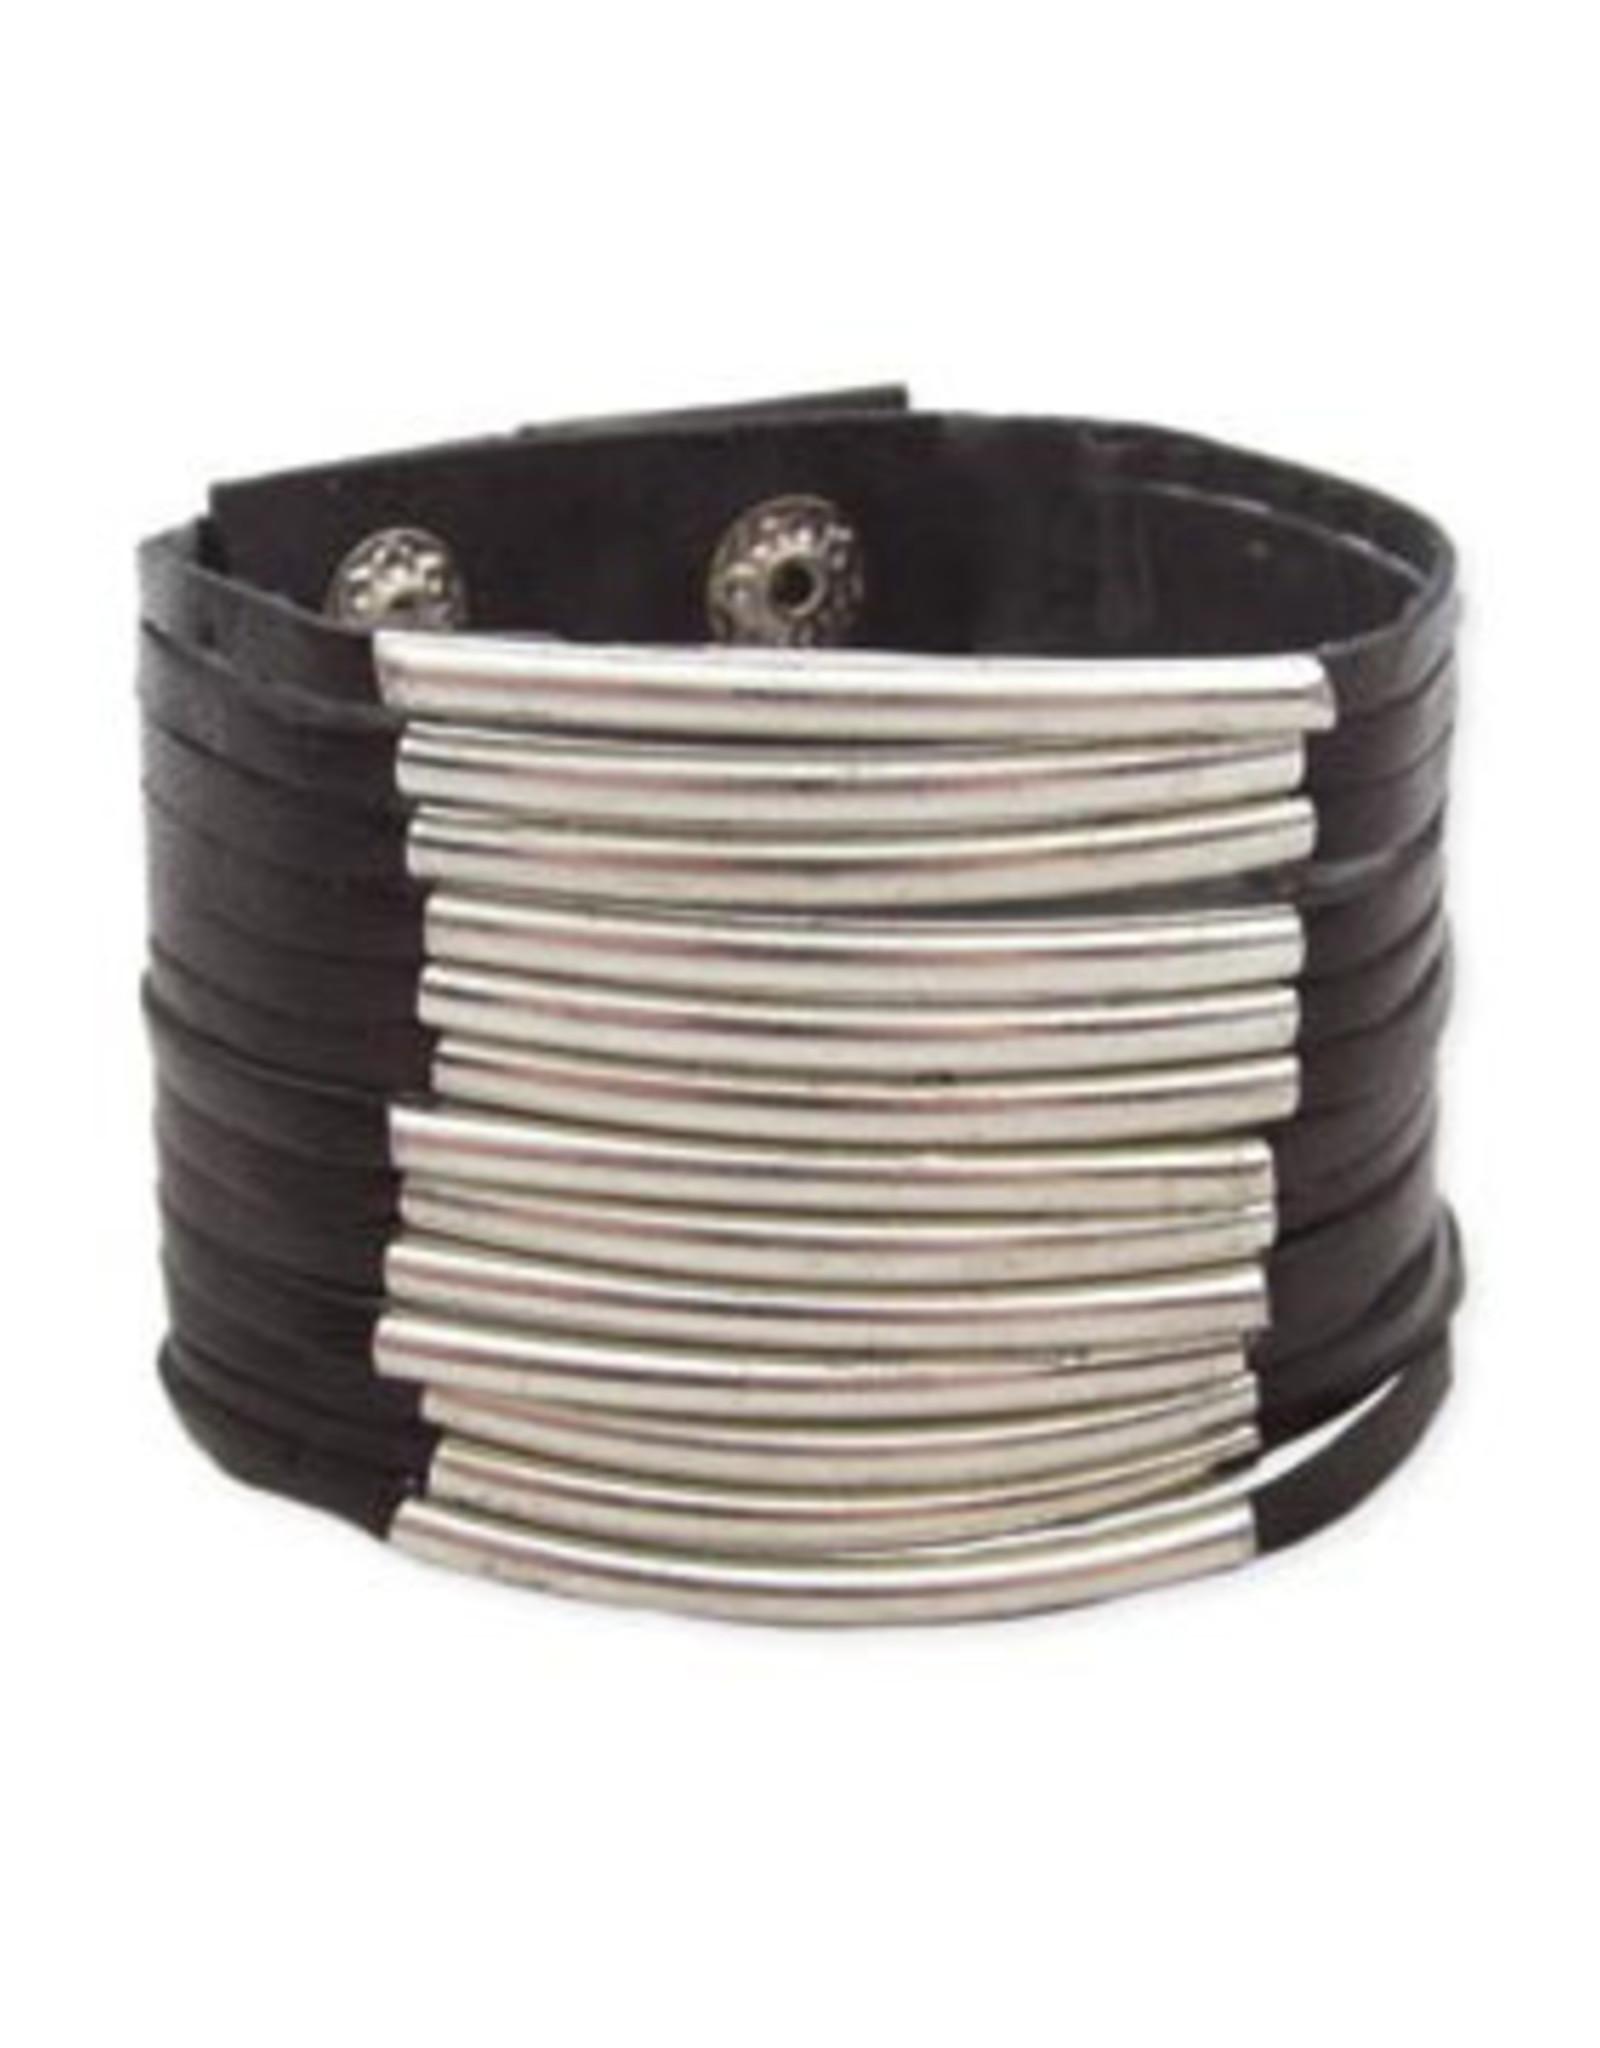 Black Leather + Silver Bar Snap Cuff Bracelet